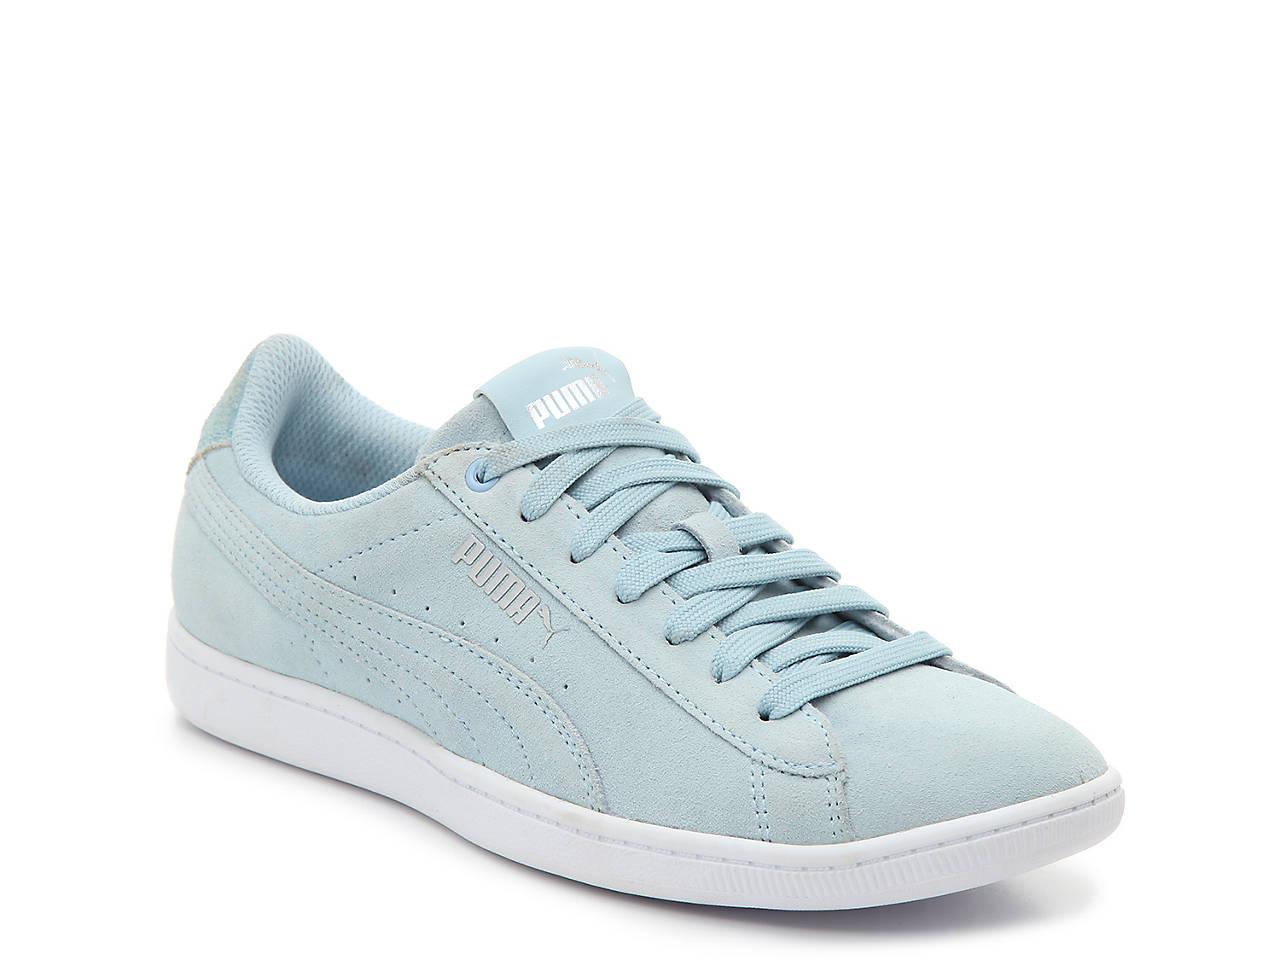 7594dd204c840a Puma Vikky Lo Suede Sneaker - Women s Women s Shoes